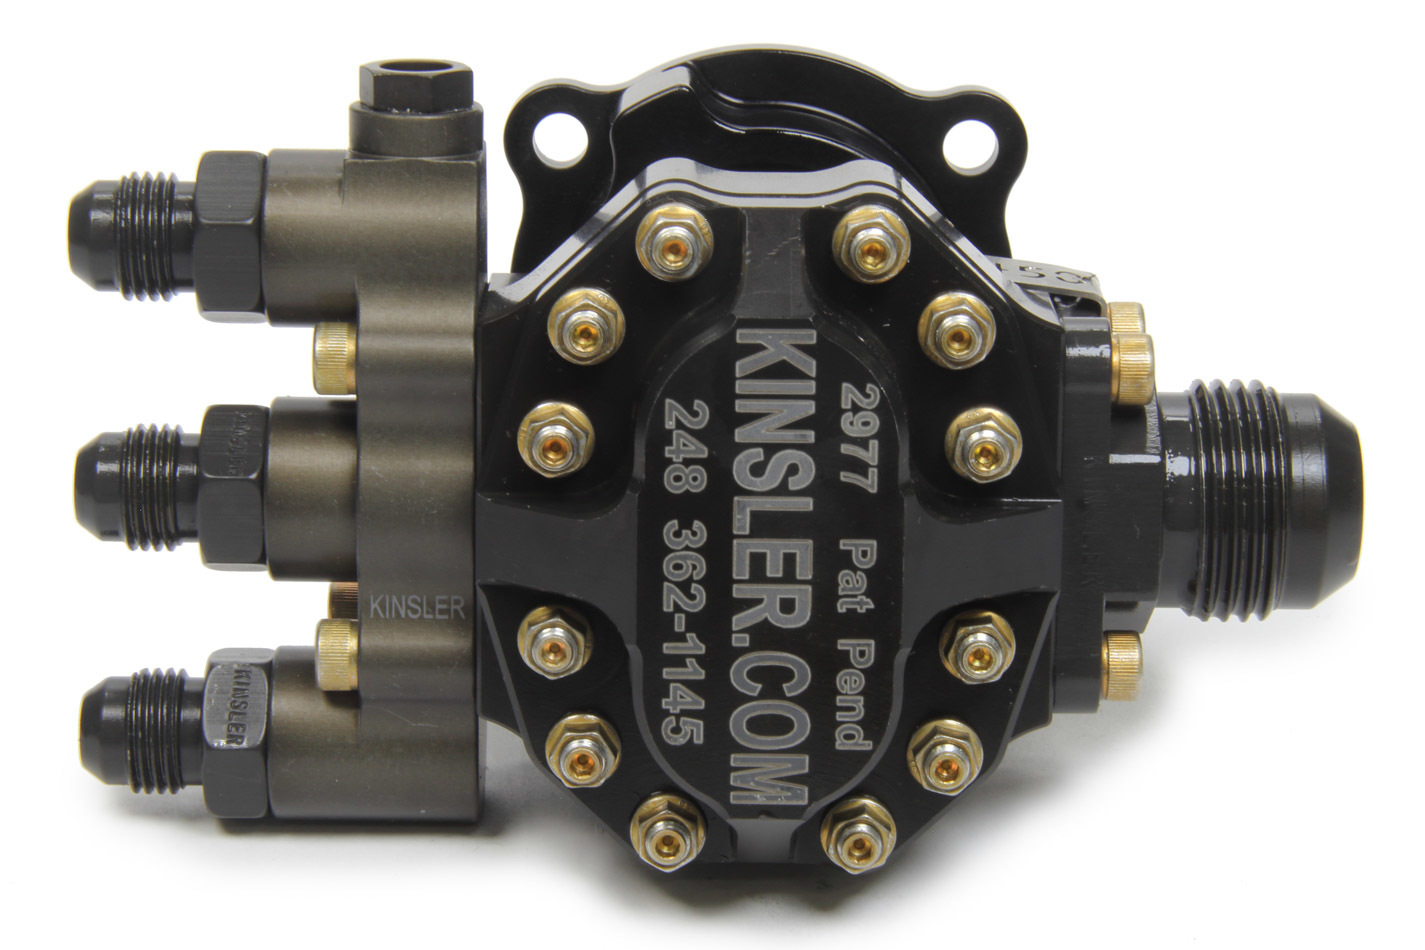 Kinsler TP045071 Fuel Pump, Tough Pump 450, Hex Driven, In-Line, 12 AN Male Inlet, Three 6 AN Male Outlets, Aluminum, Black Anodize, Alcohol / E85 / Gas, Each